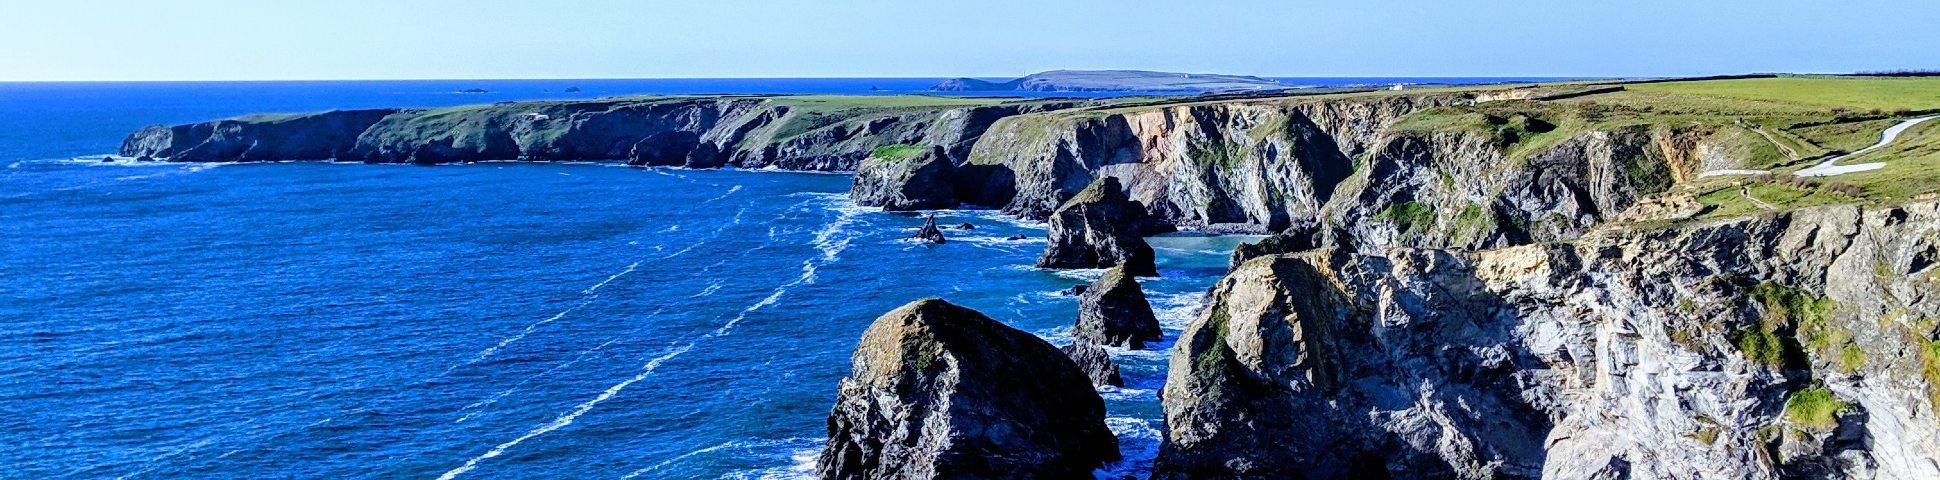 Rugged coastline of South West England